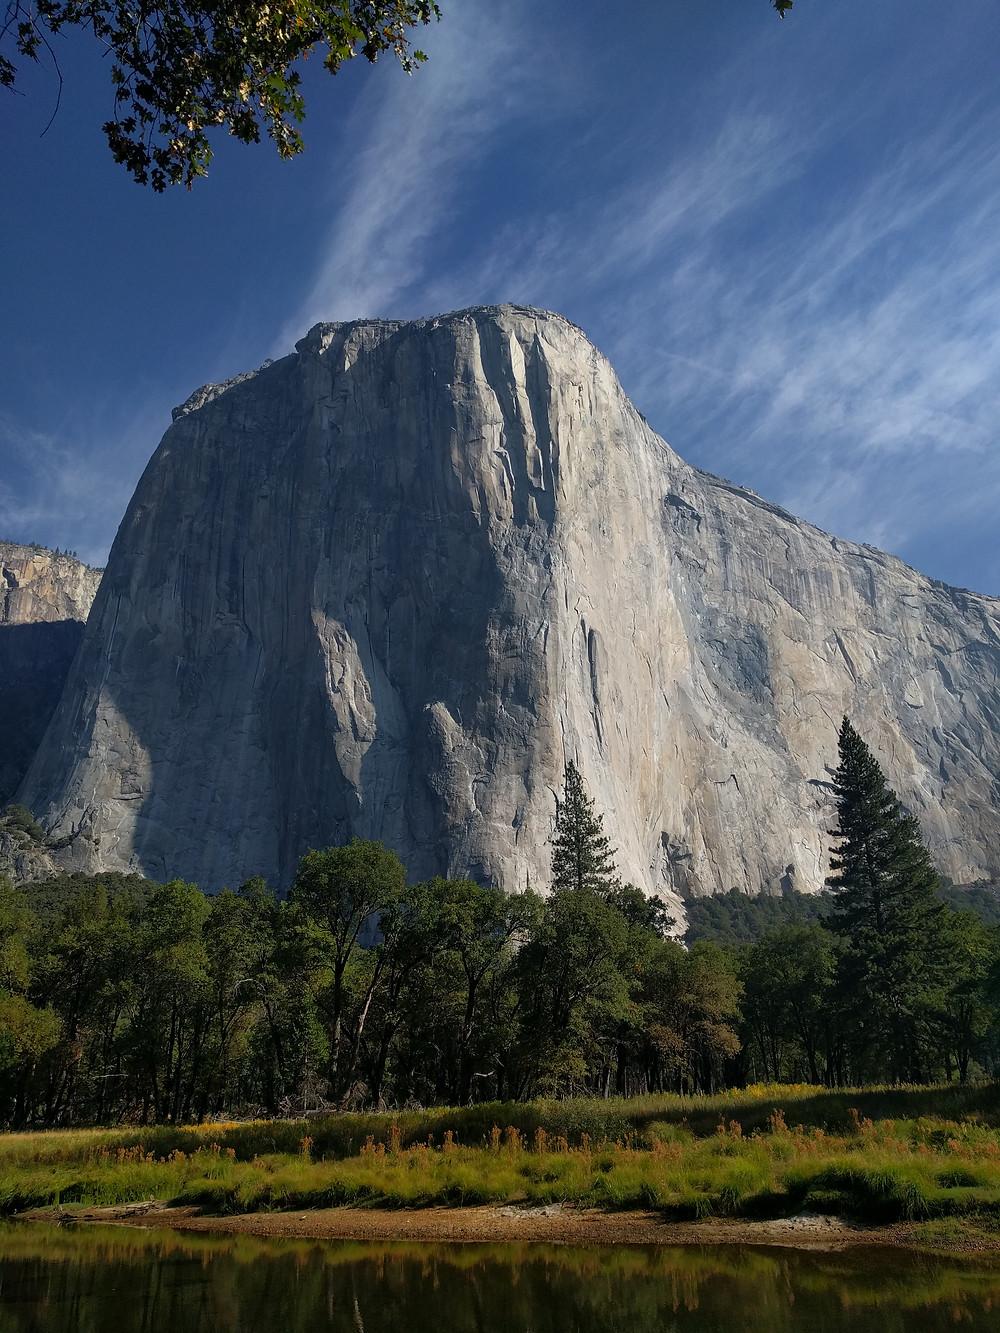 El Capitan, Yosemite, California.